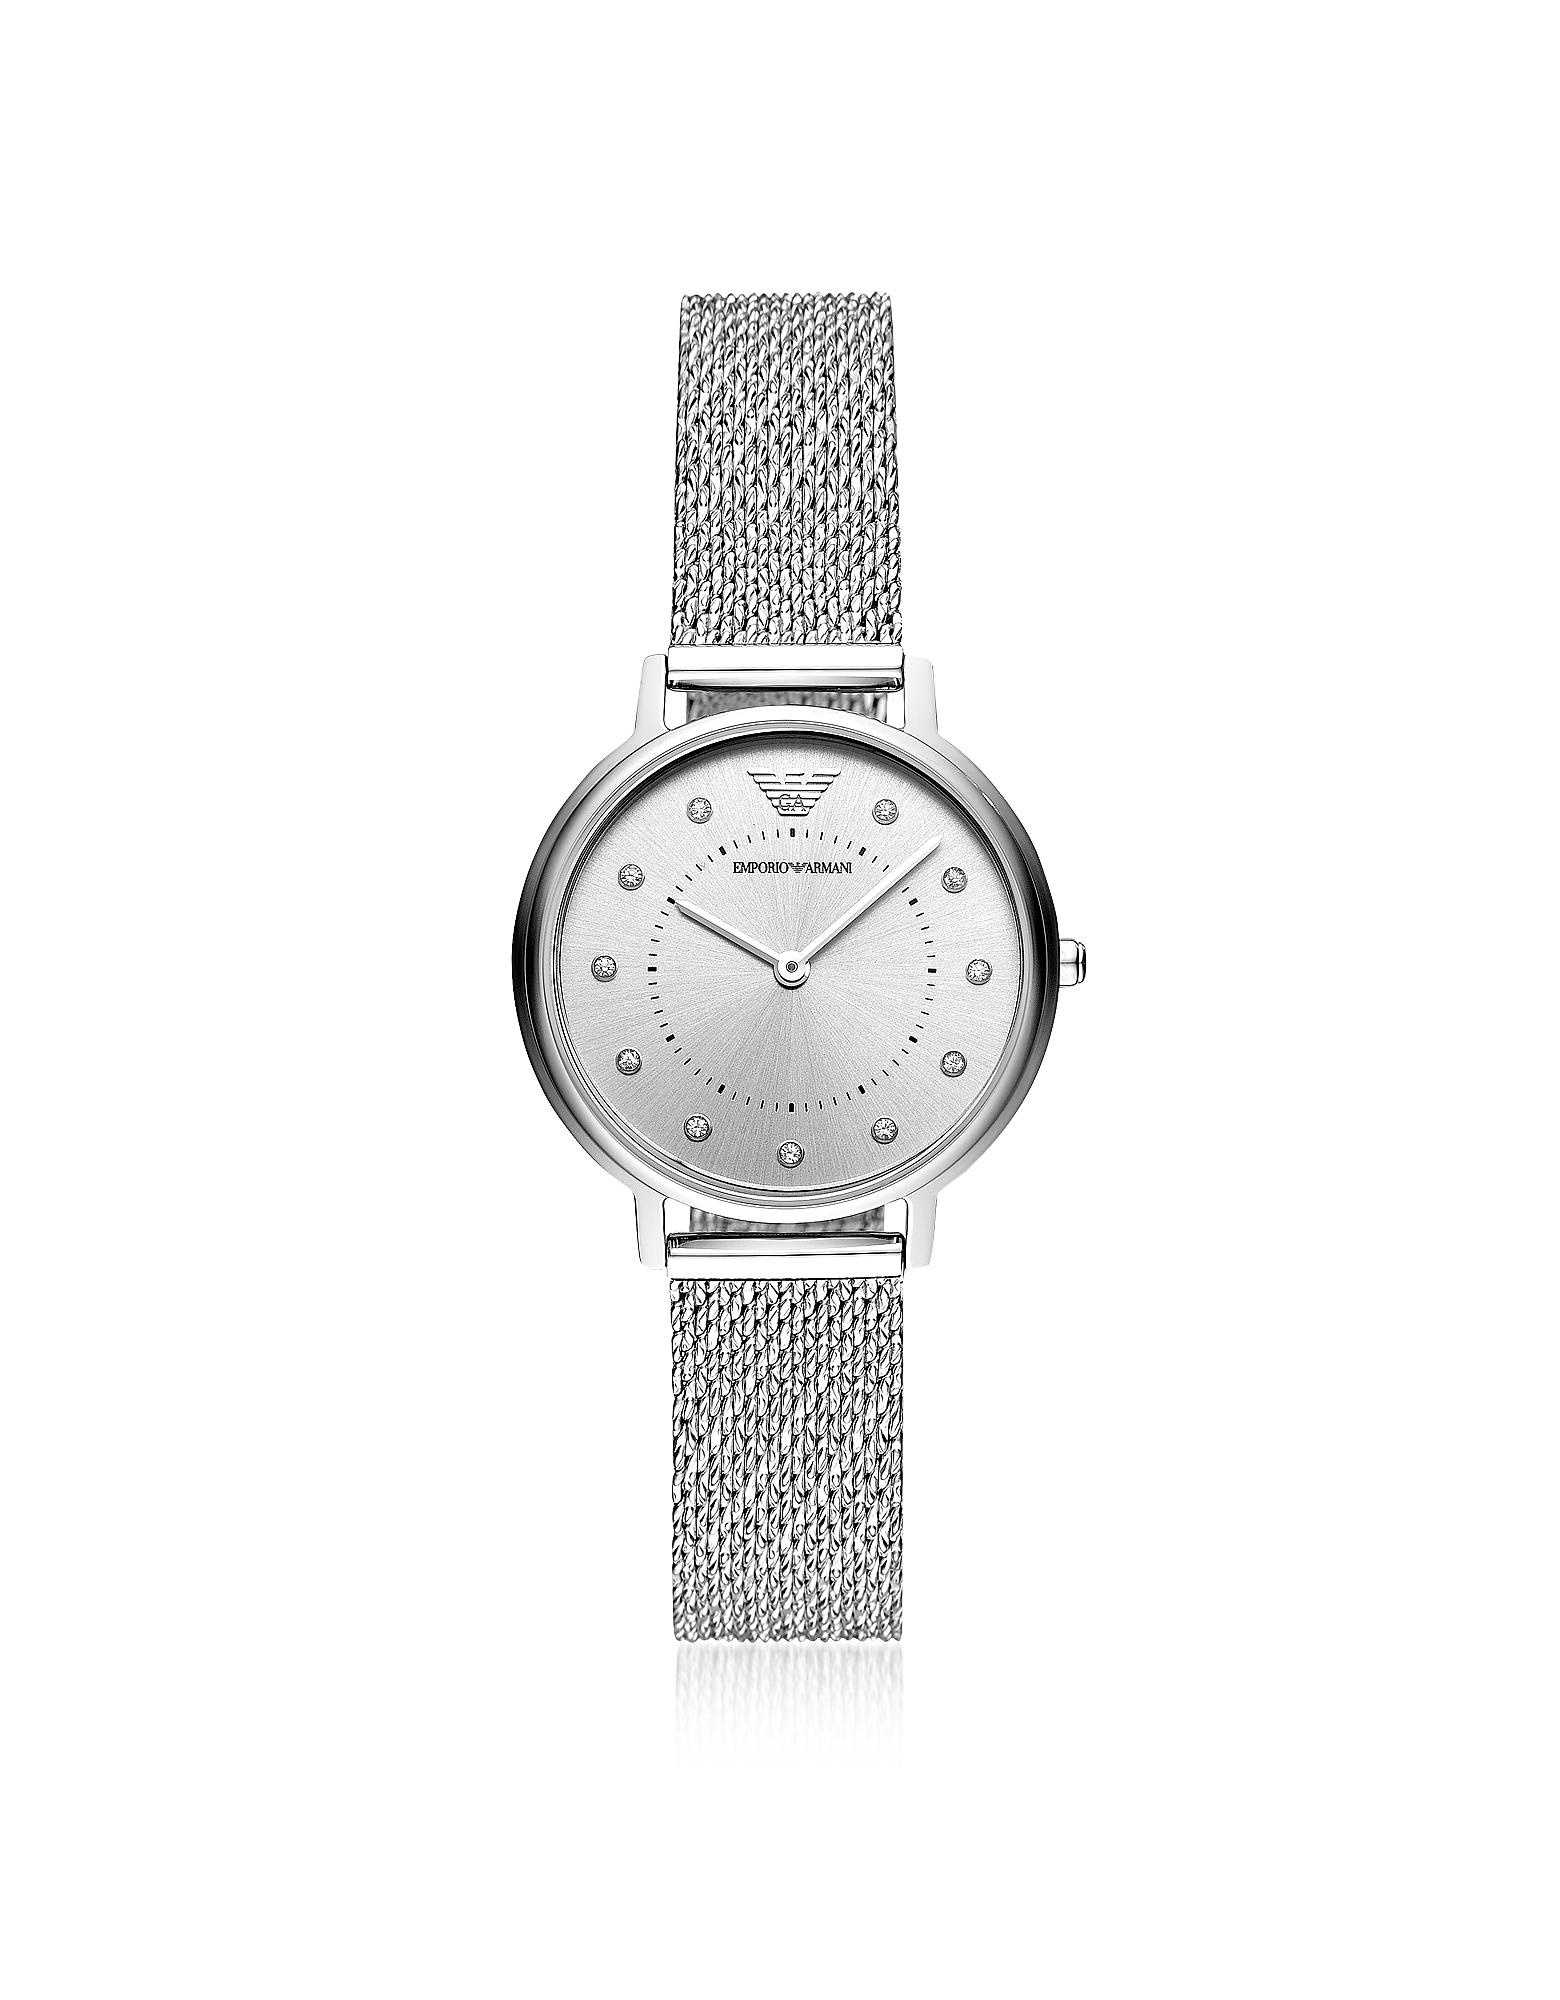 Emporio Armani Women's Watches, Kappa Stainless Steel Mesh Women's Watch